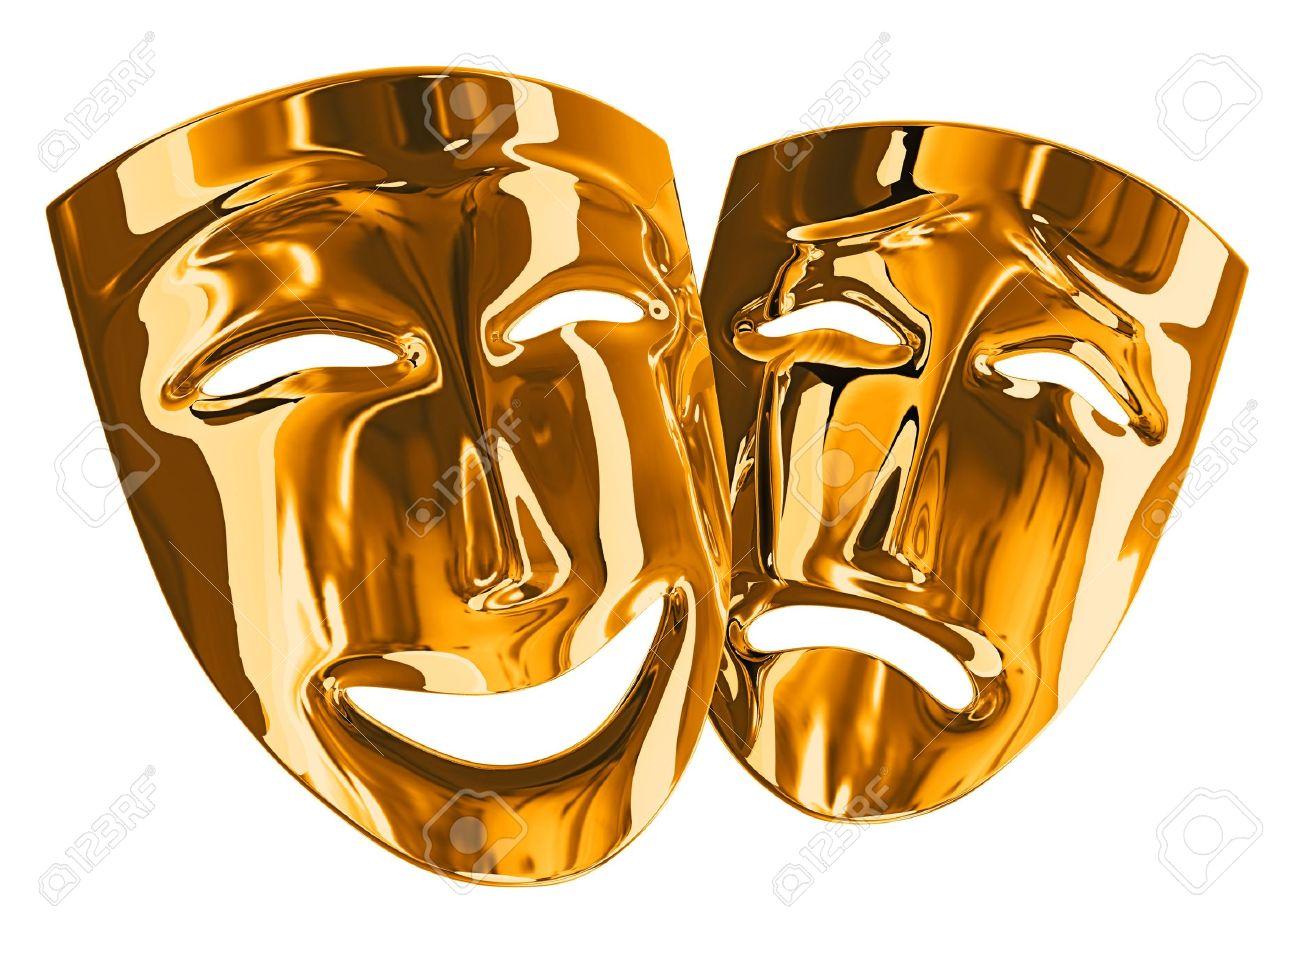 Znalezione obrazy dla zapytania maski teatralne